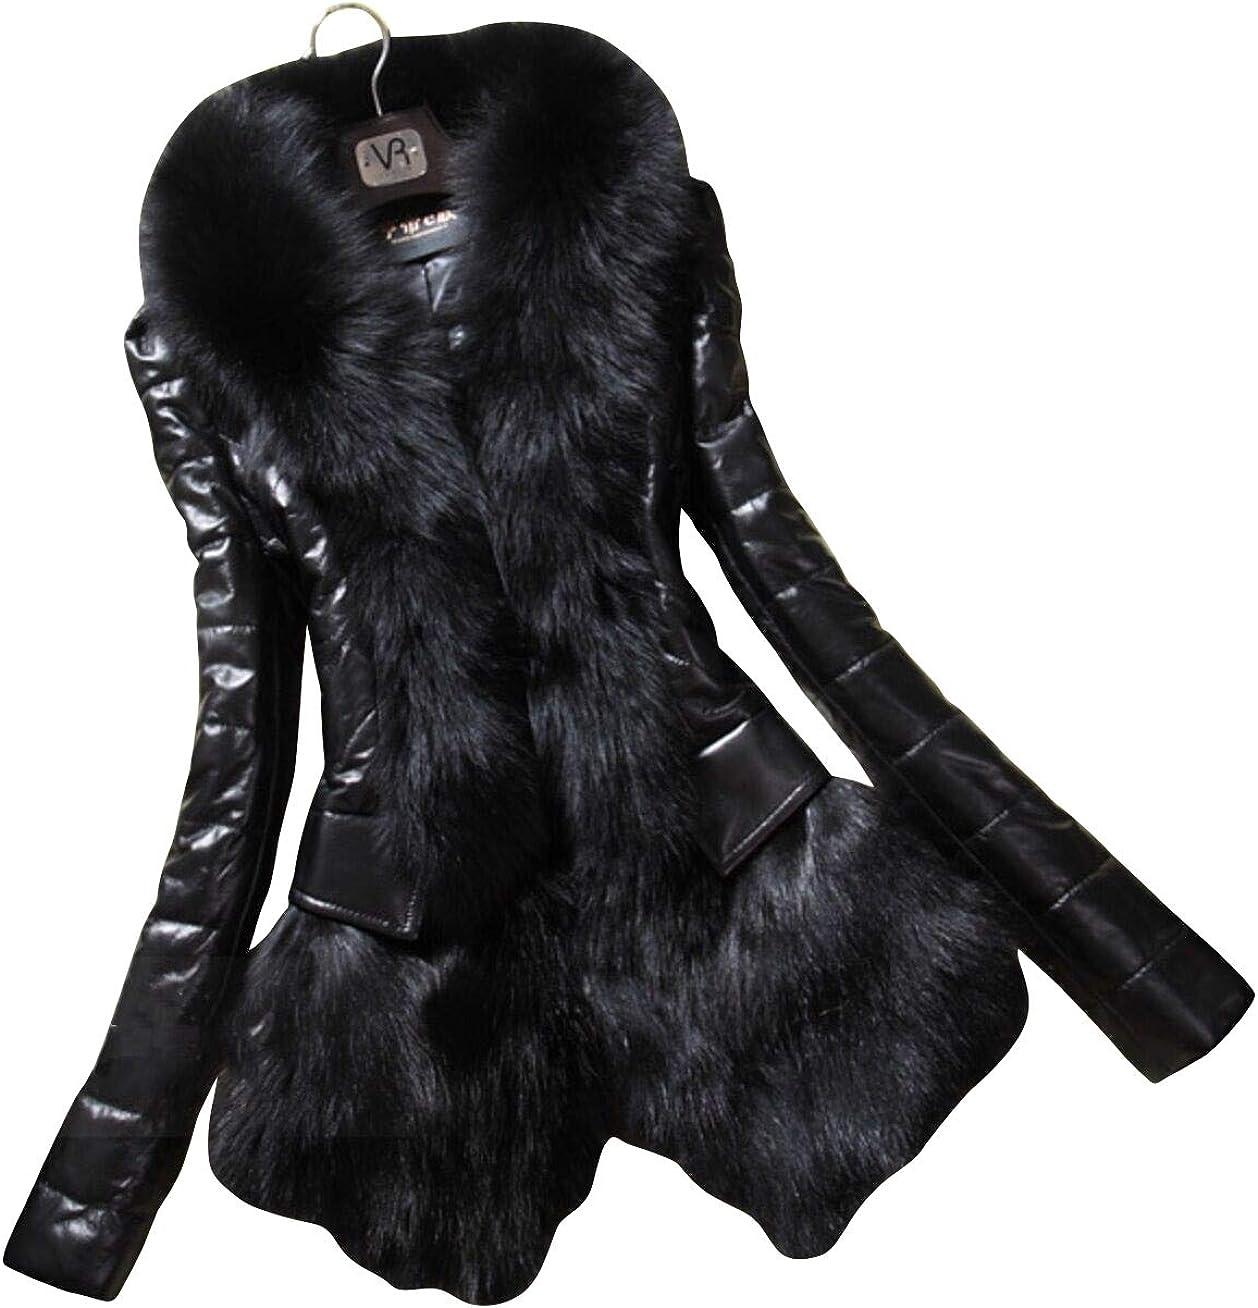 CHARTOU Women's Shawl Collar Faux Fur PU Leather Mid Long Windproof Coat Outwear